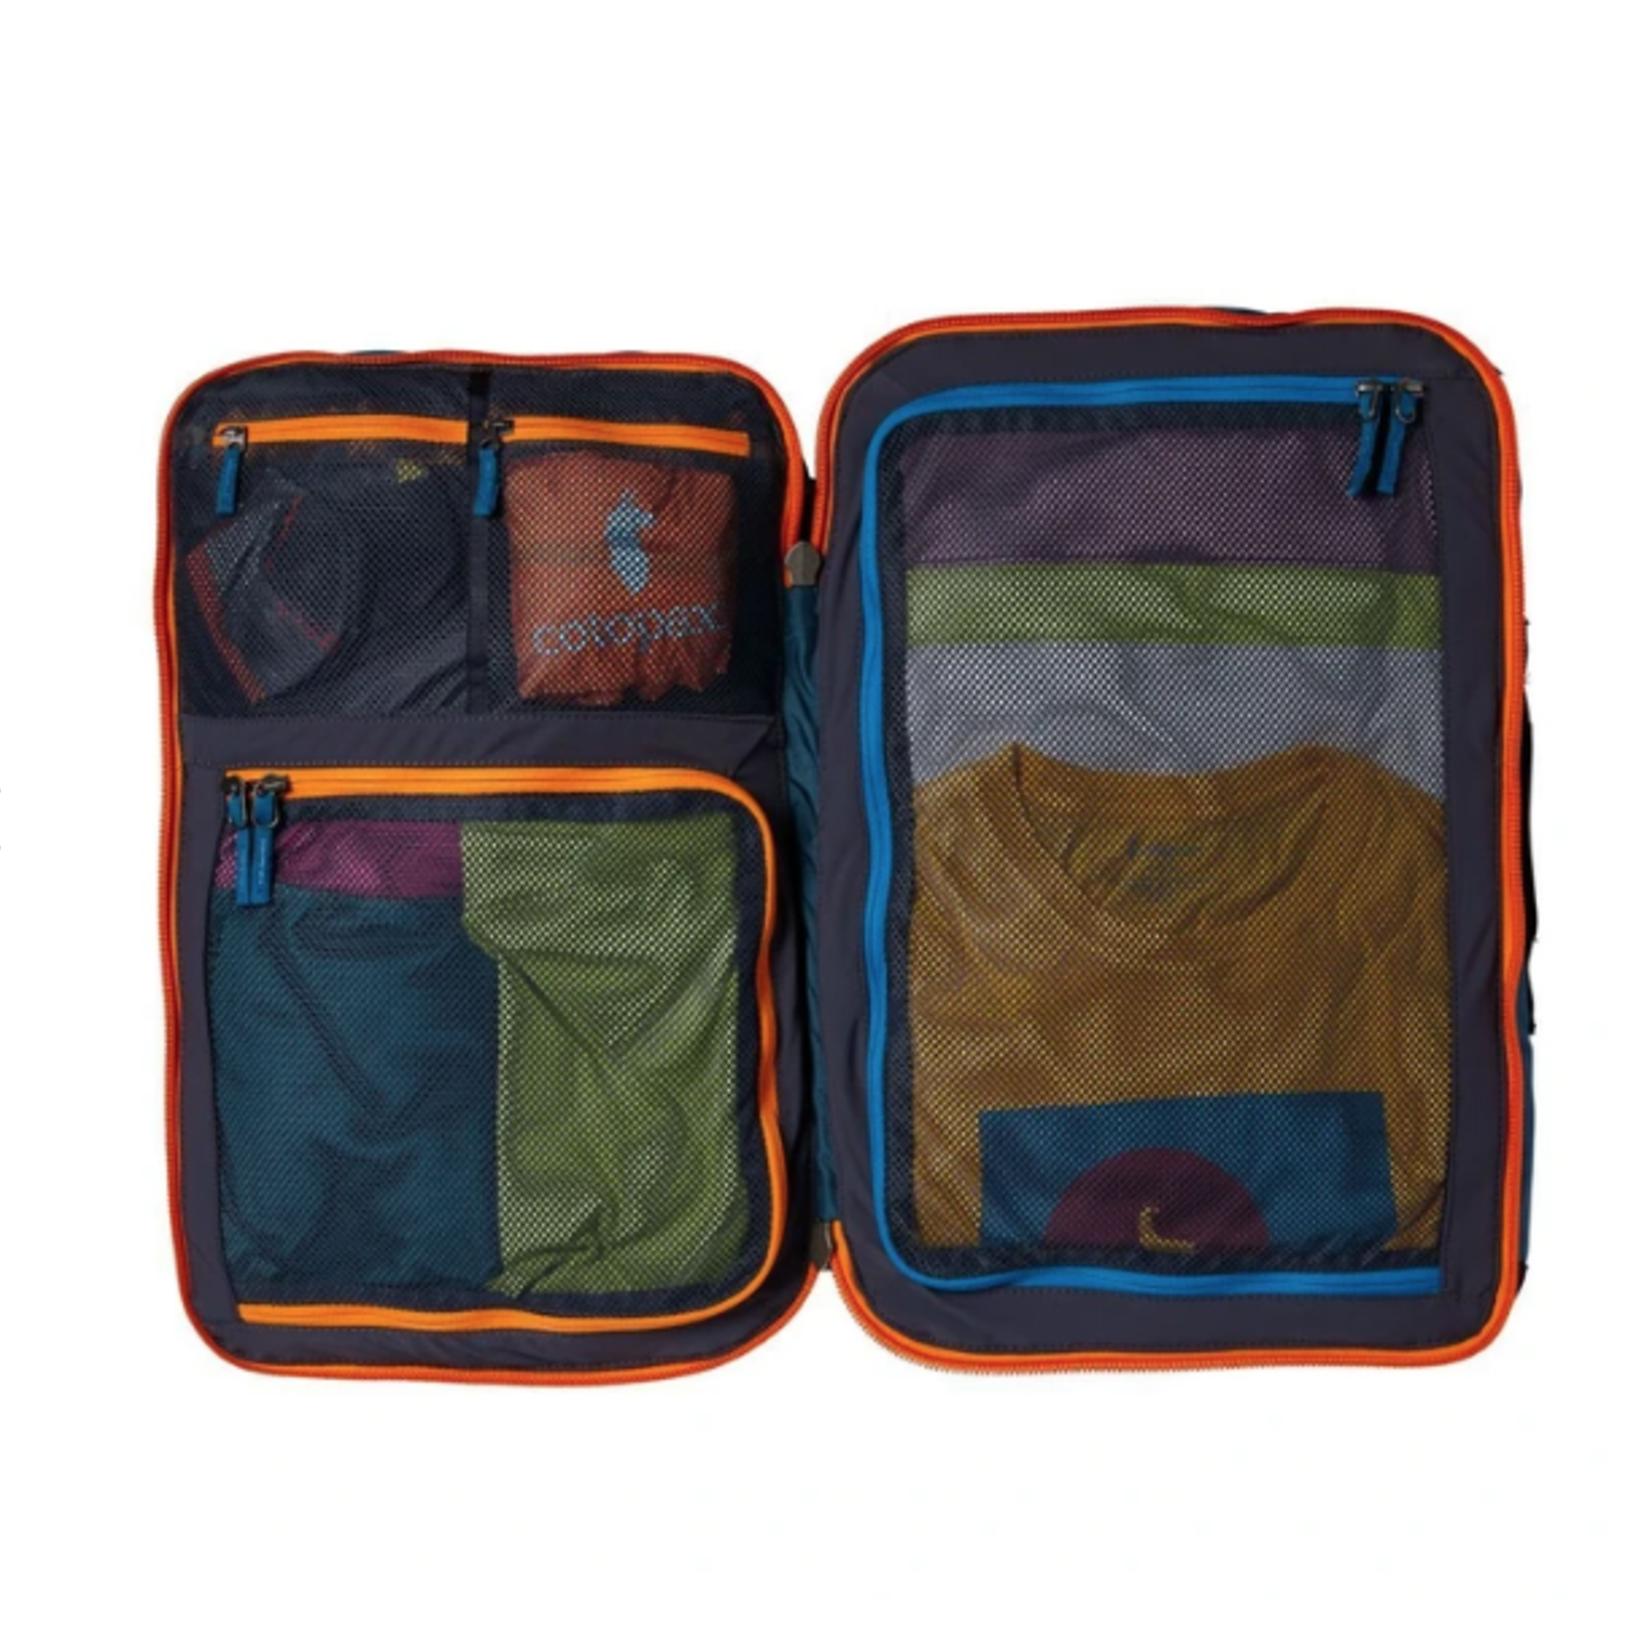 Cotopaxi Cotopaxi Allpa 35L Travel Pack